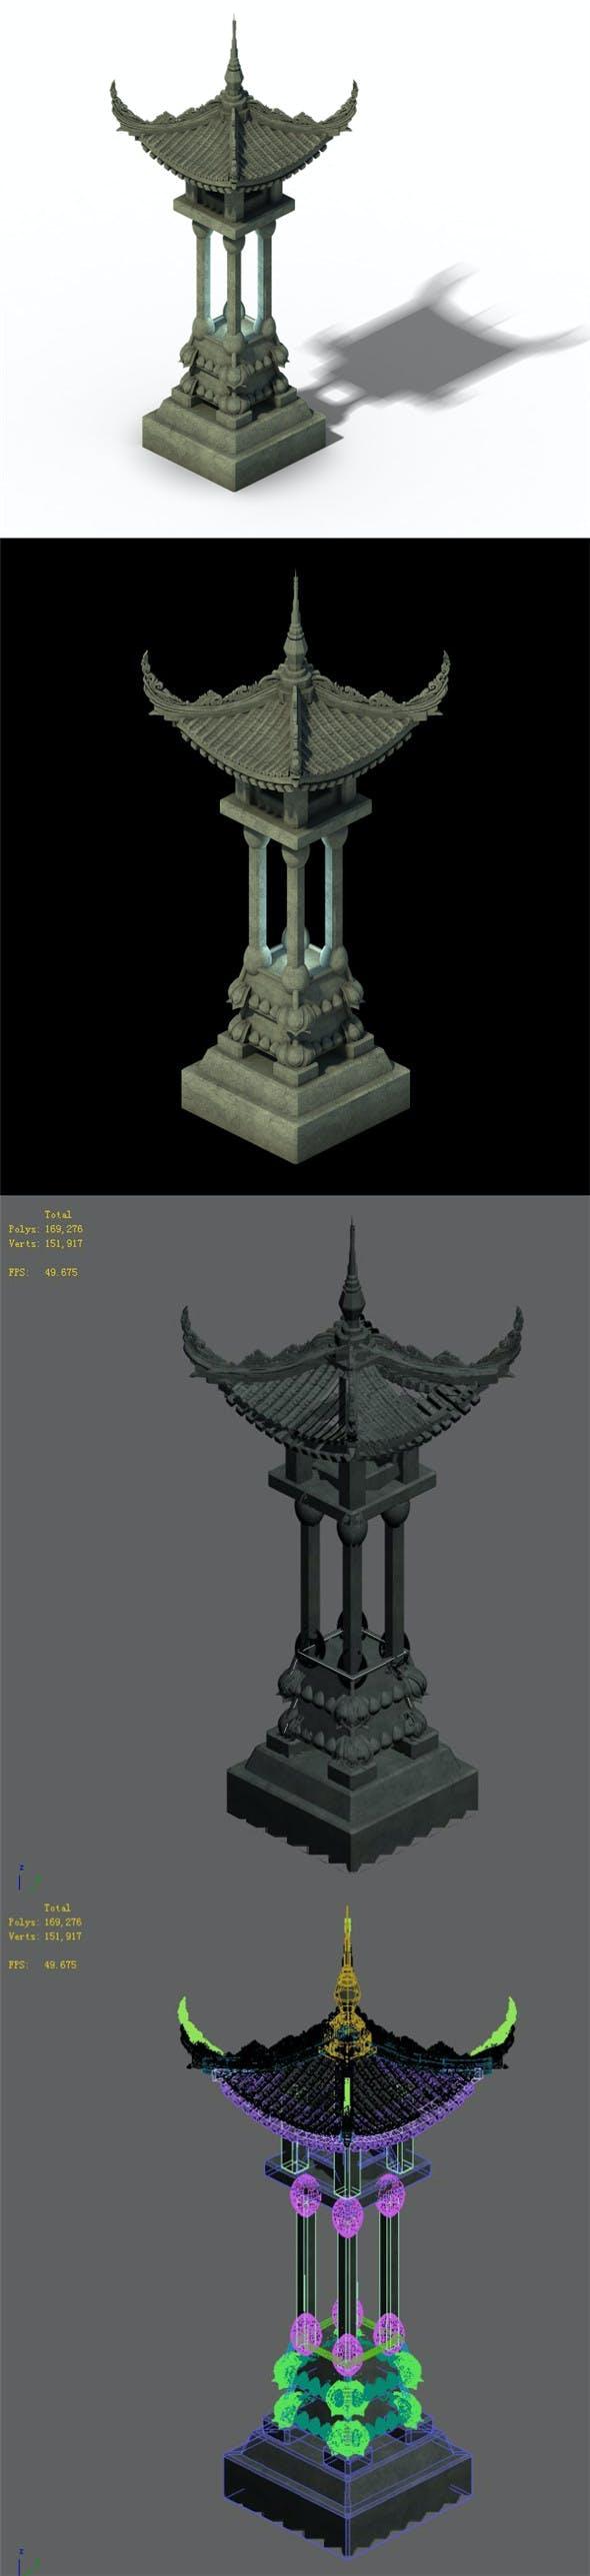 Architecture - Windland Prairie - Stone Lamp 02 - 3DOcean Item for Sale